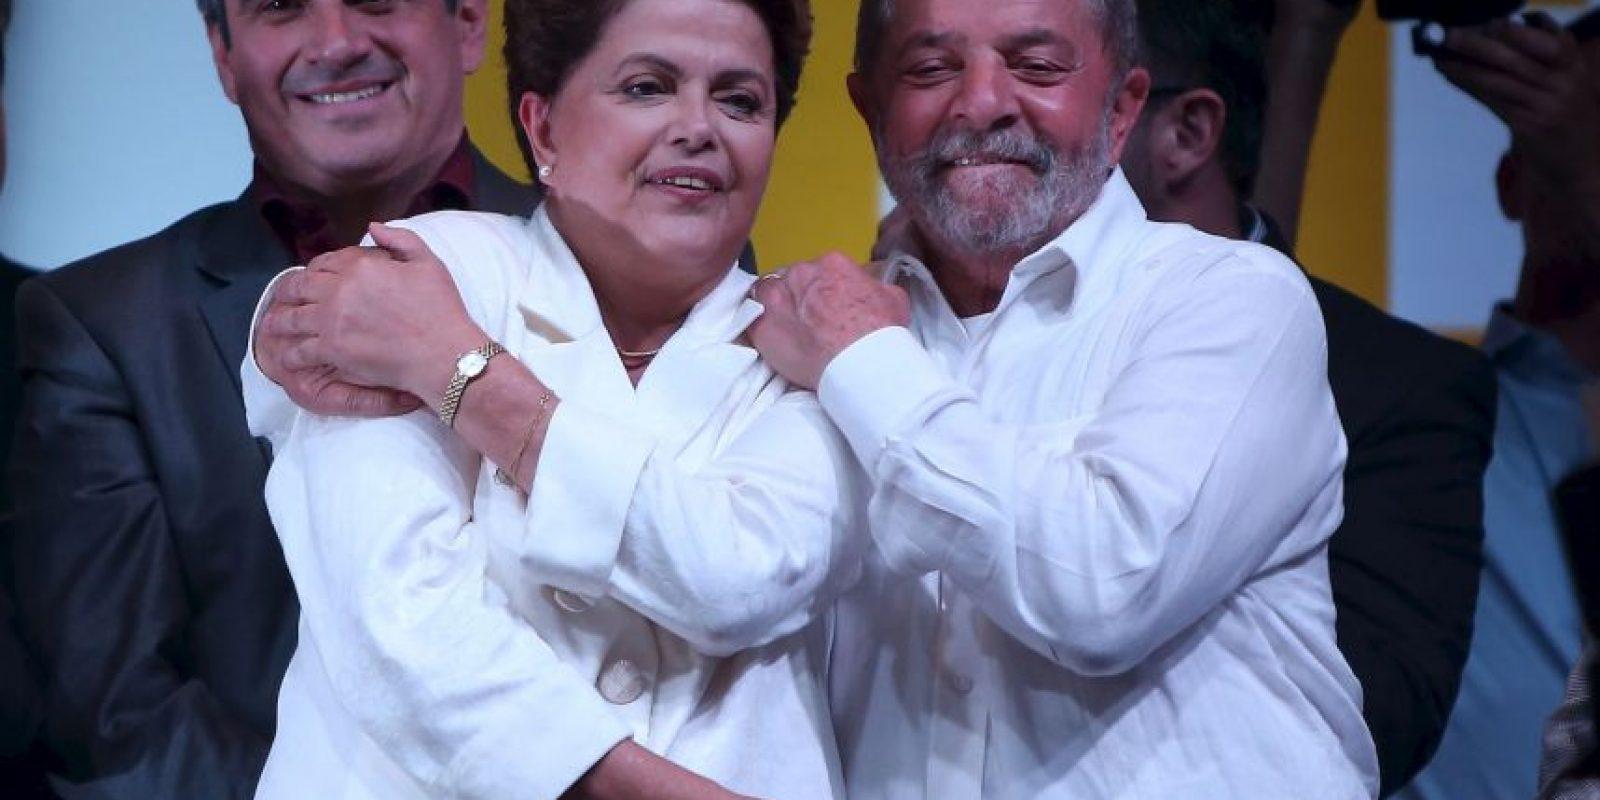 Siendo sustituido por Dilma Rousseff, actual presidenta de Brasil Foto:Getty Images